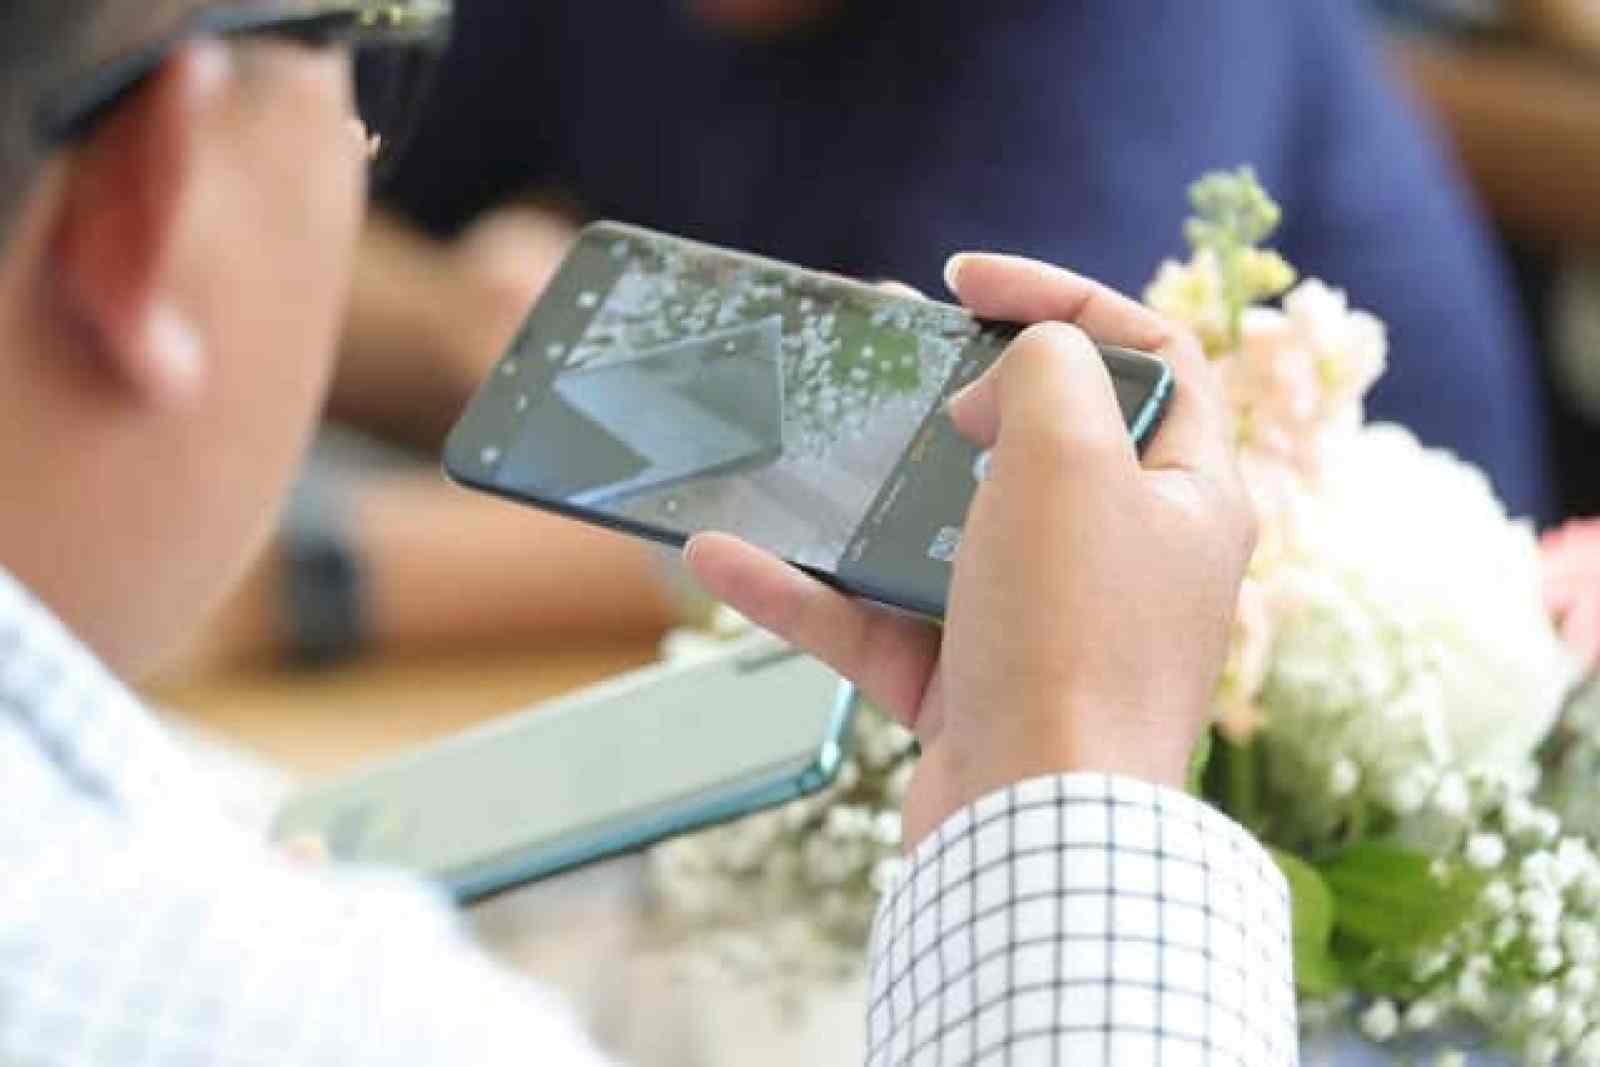 - Xiaomi6 2 - Xiaomi มียอดจัดส่งสมาร์ทโฟนได้กว่า 100 ล้านเครื่อง ขึ้นแท่นเป็นผู้จำหน่ายโทรศัพท์มือถือที่เติบโตเร็วที่สุดในประเทศไทย